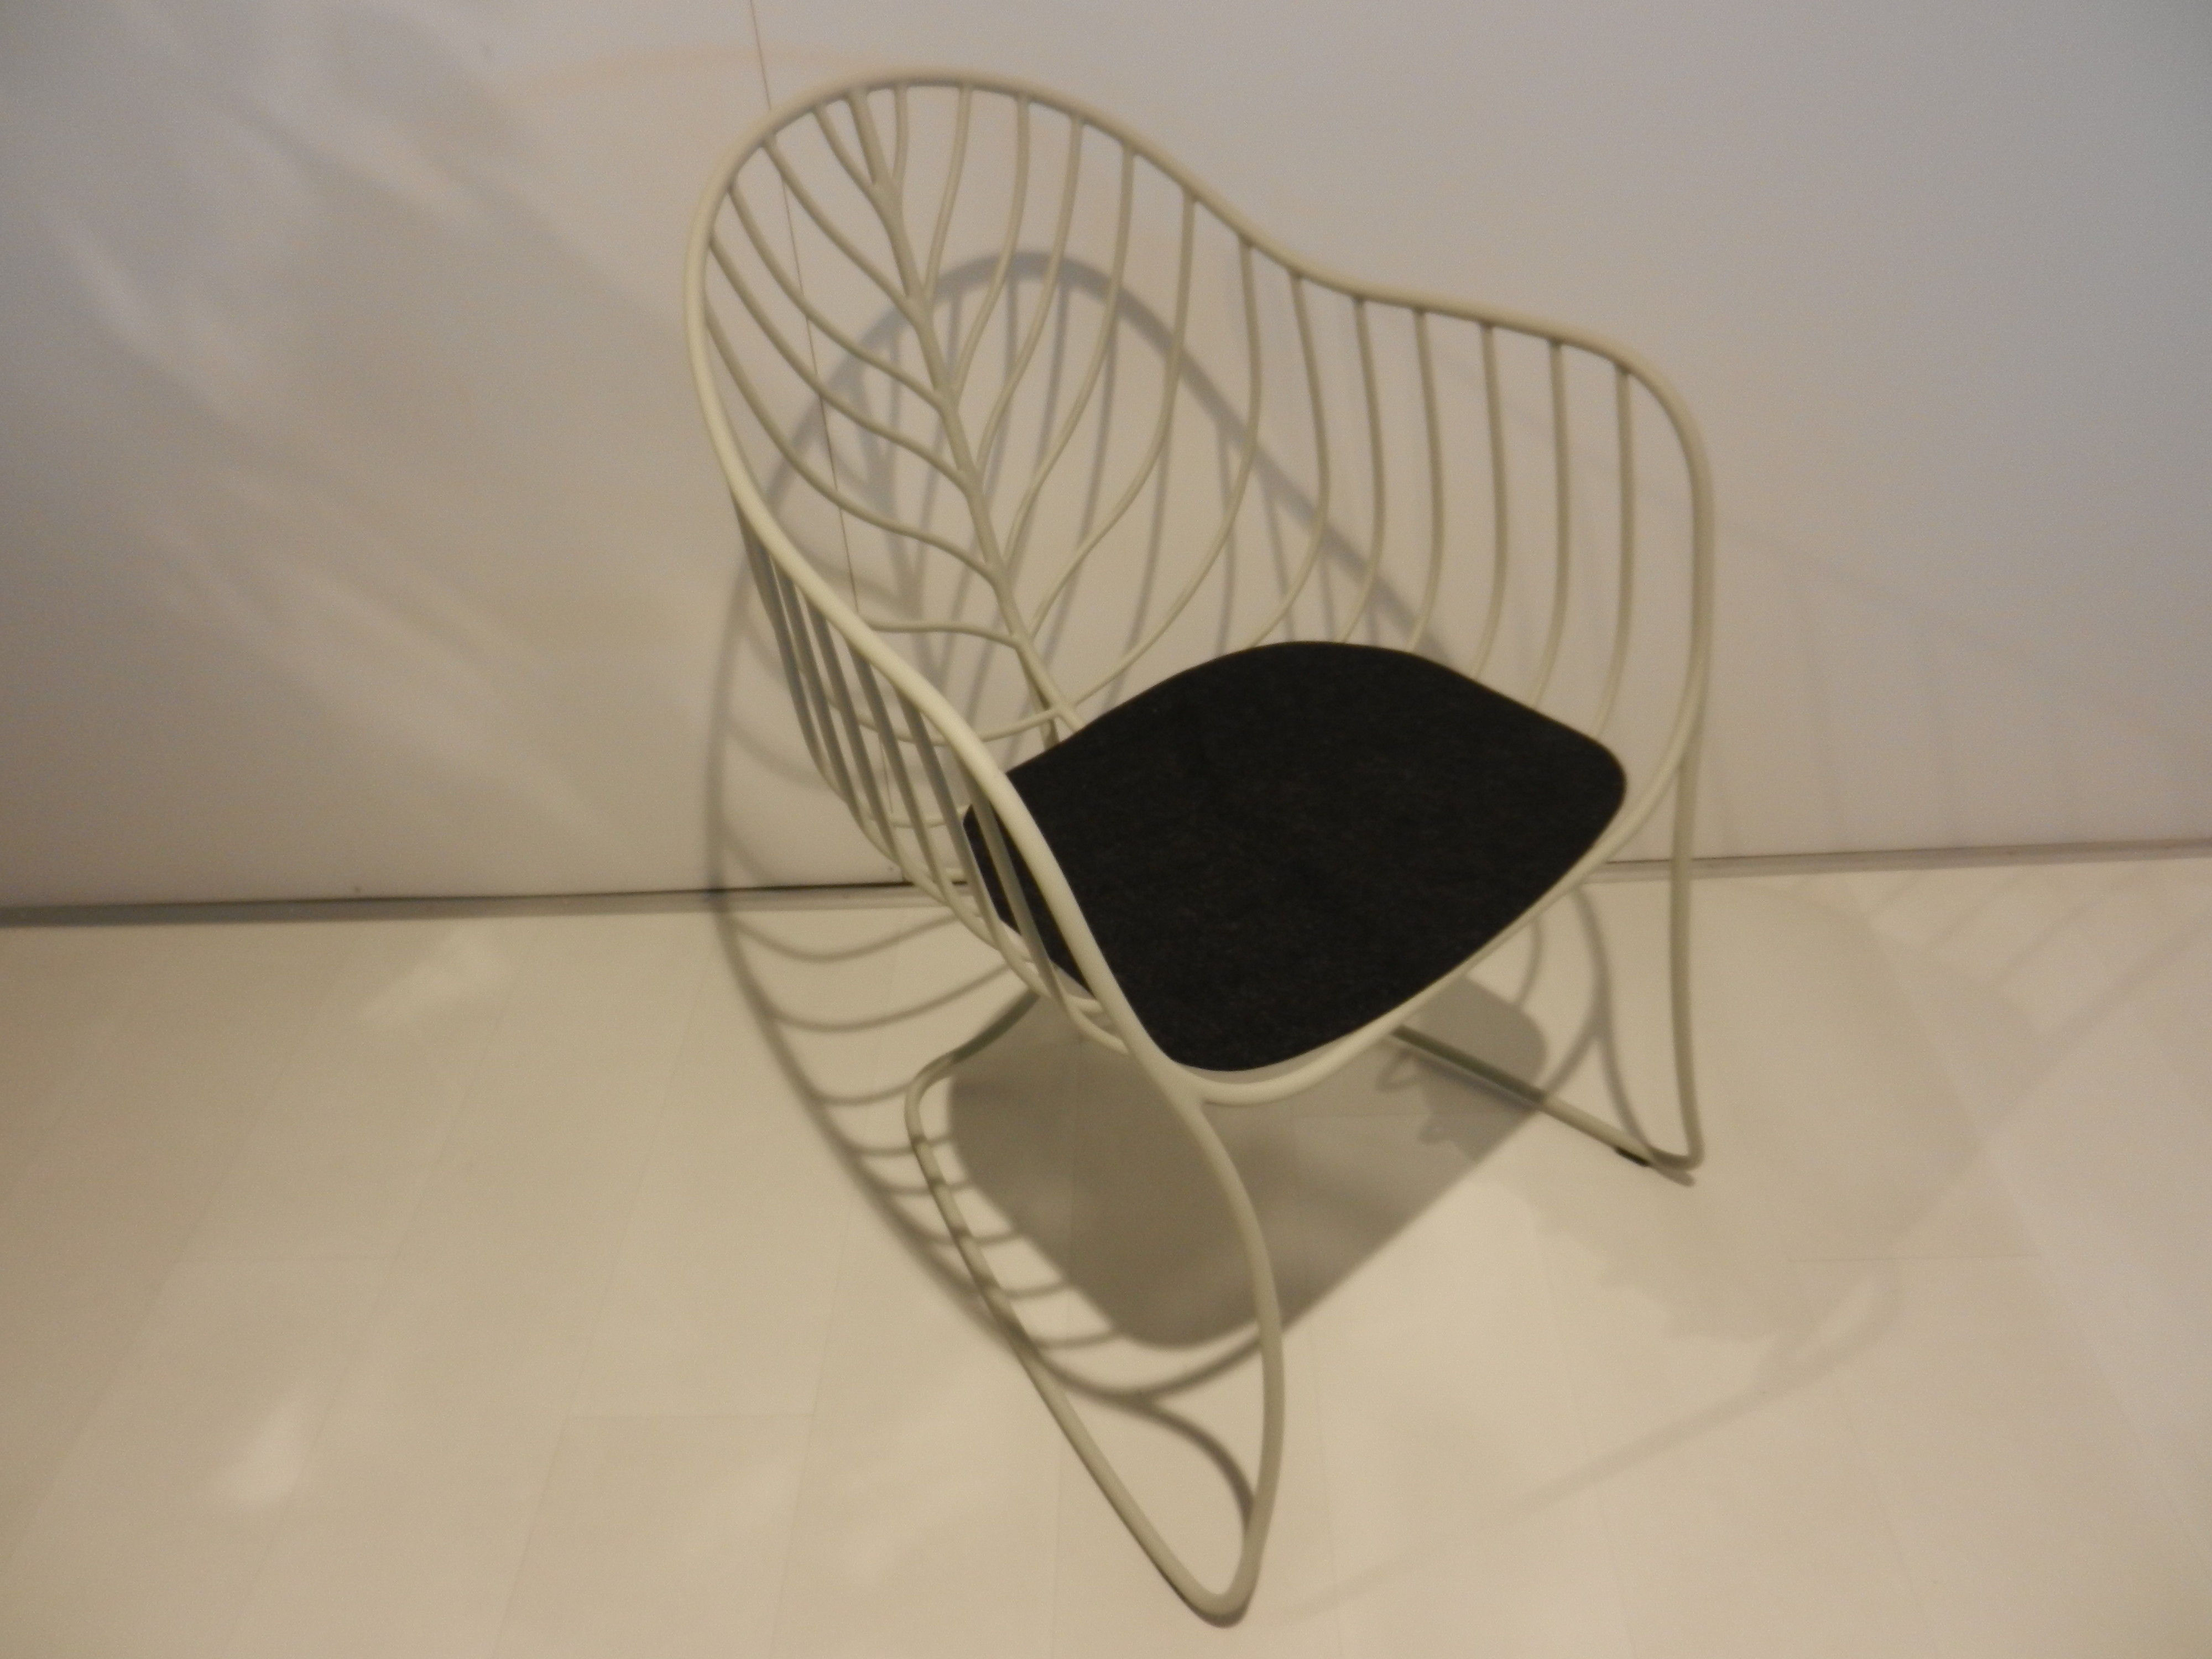 4 Stühle Folia von Royal Botania 08